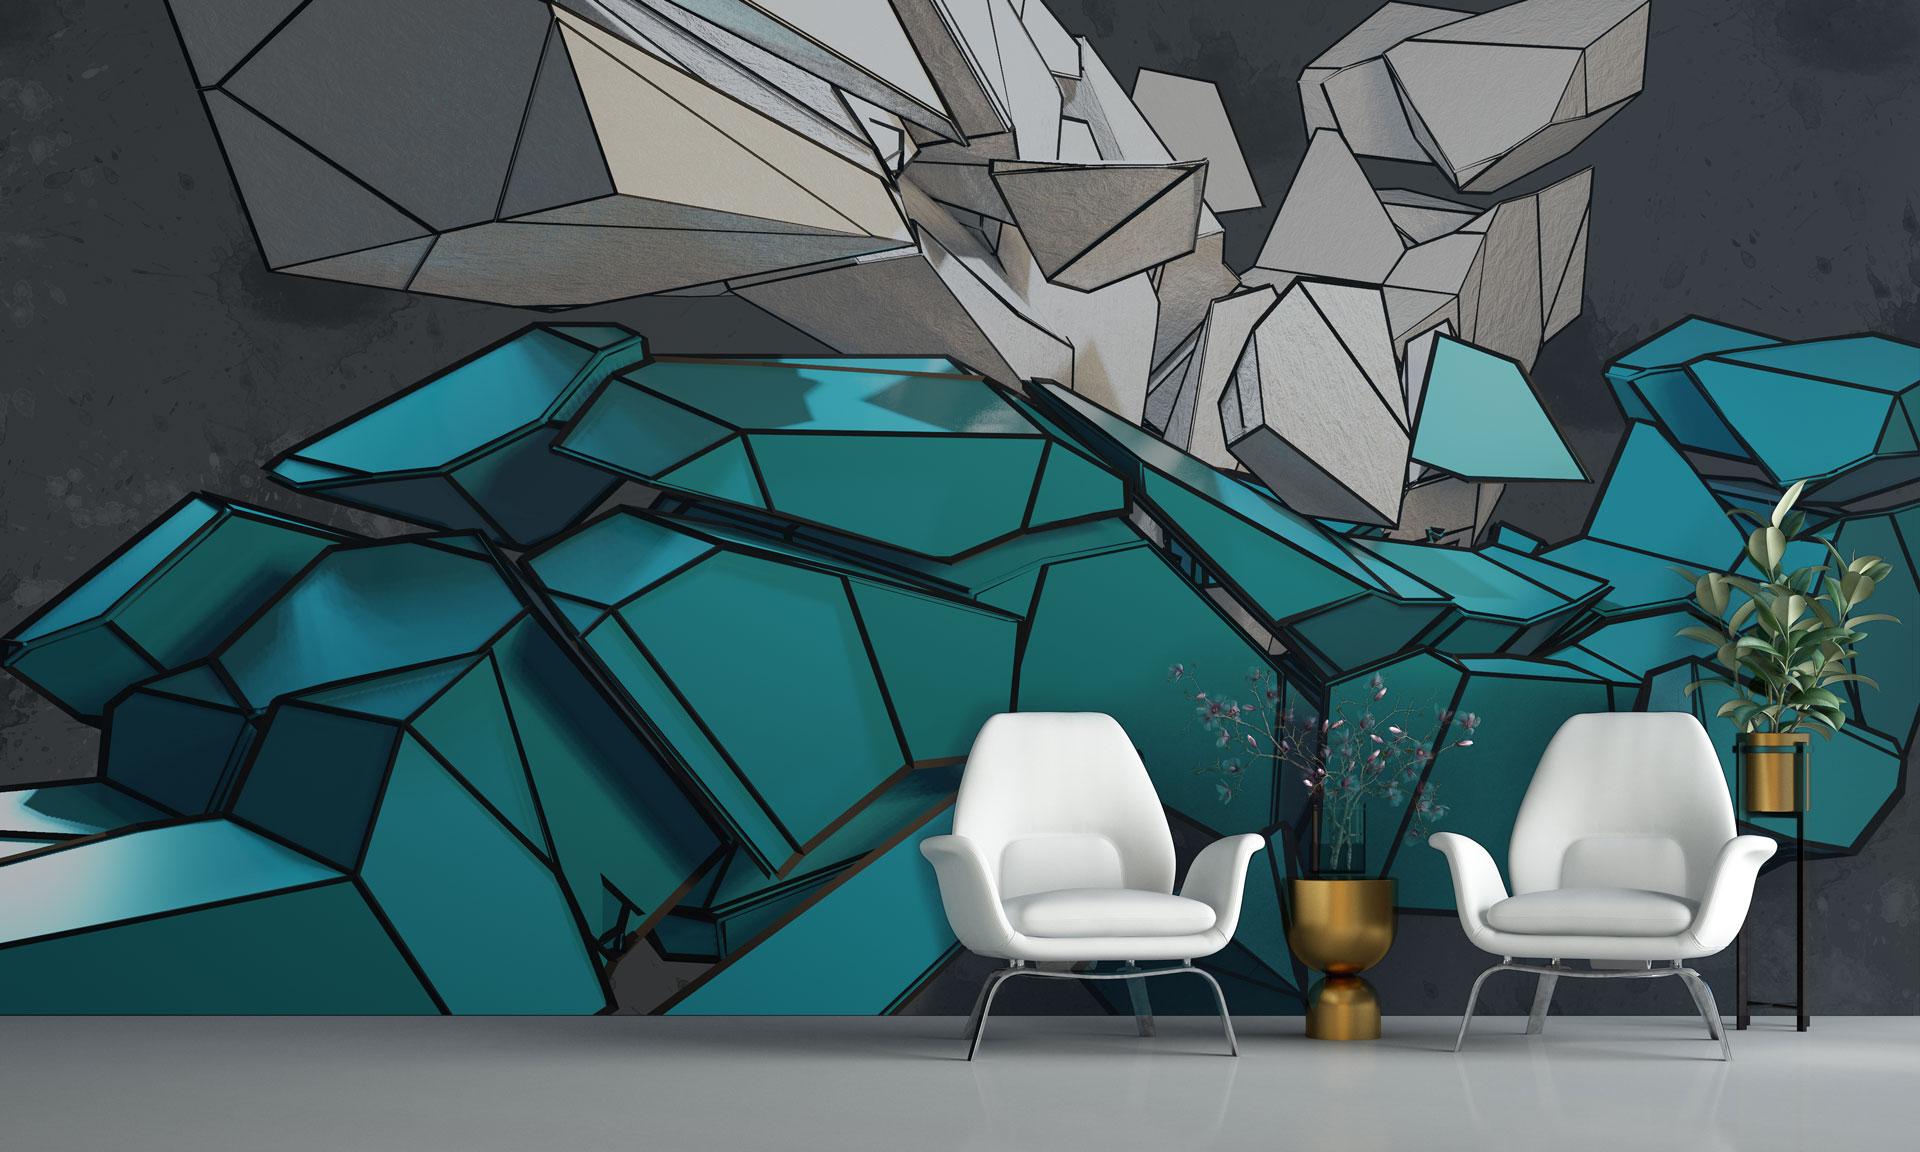 zithoek wall design interieur architectuur